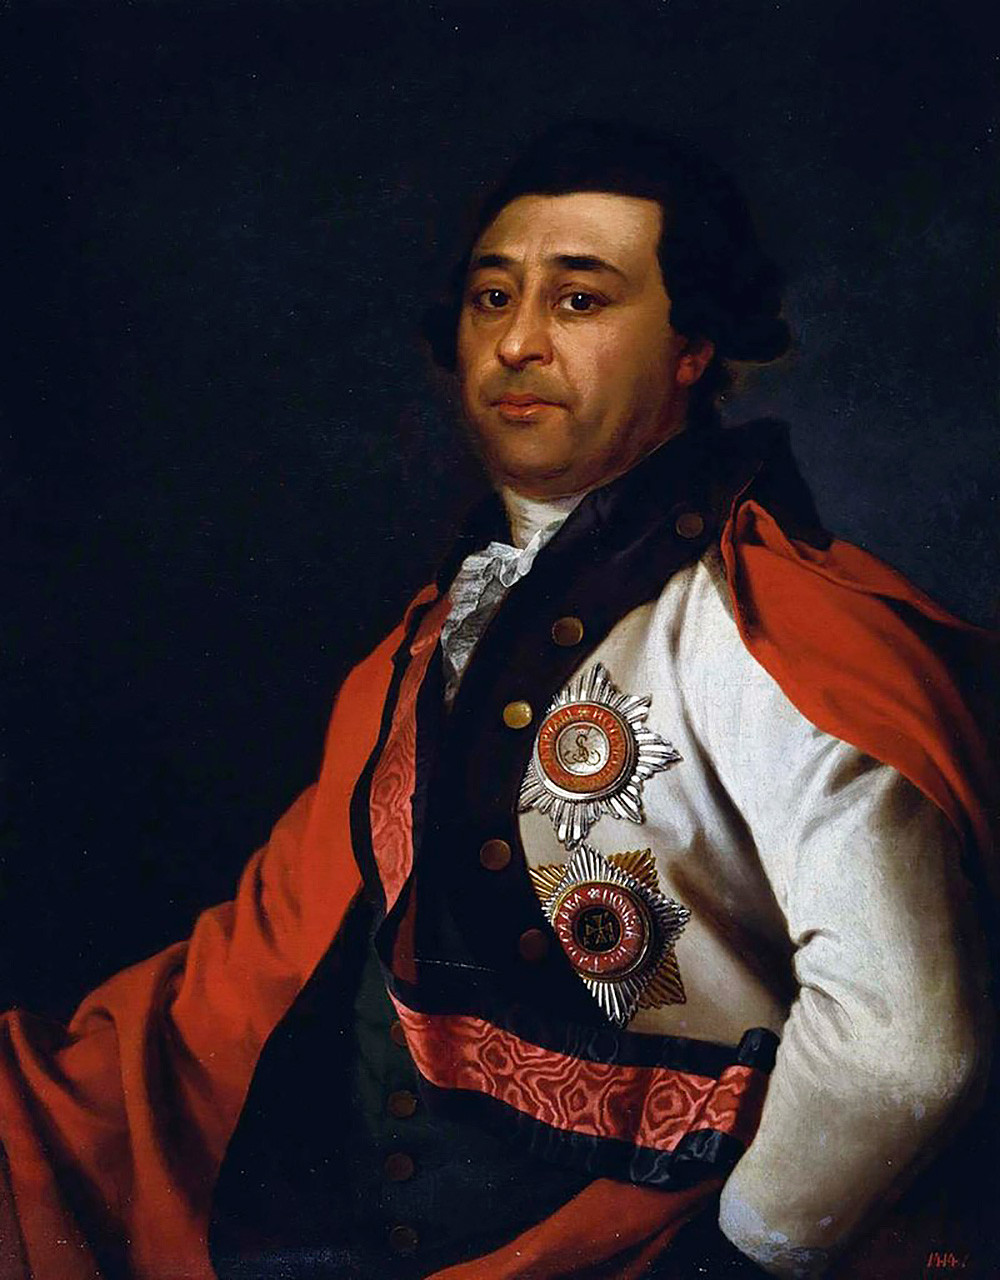 Иван Абрамович Ганнибал (1735-1801), сын арапа Петра Великого